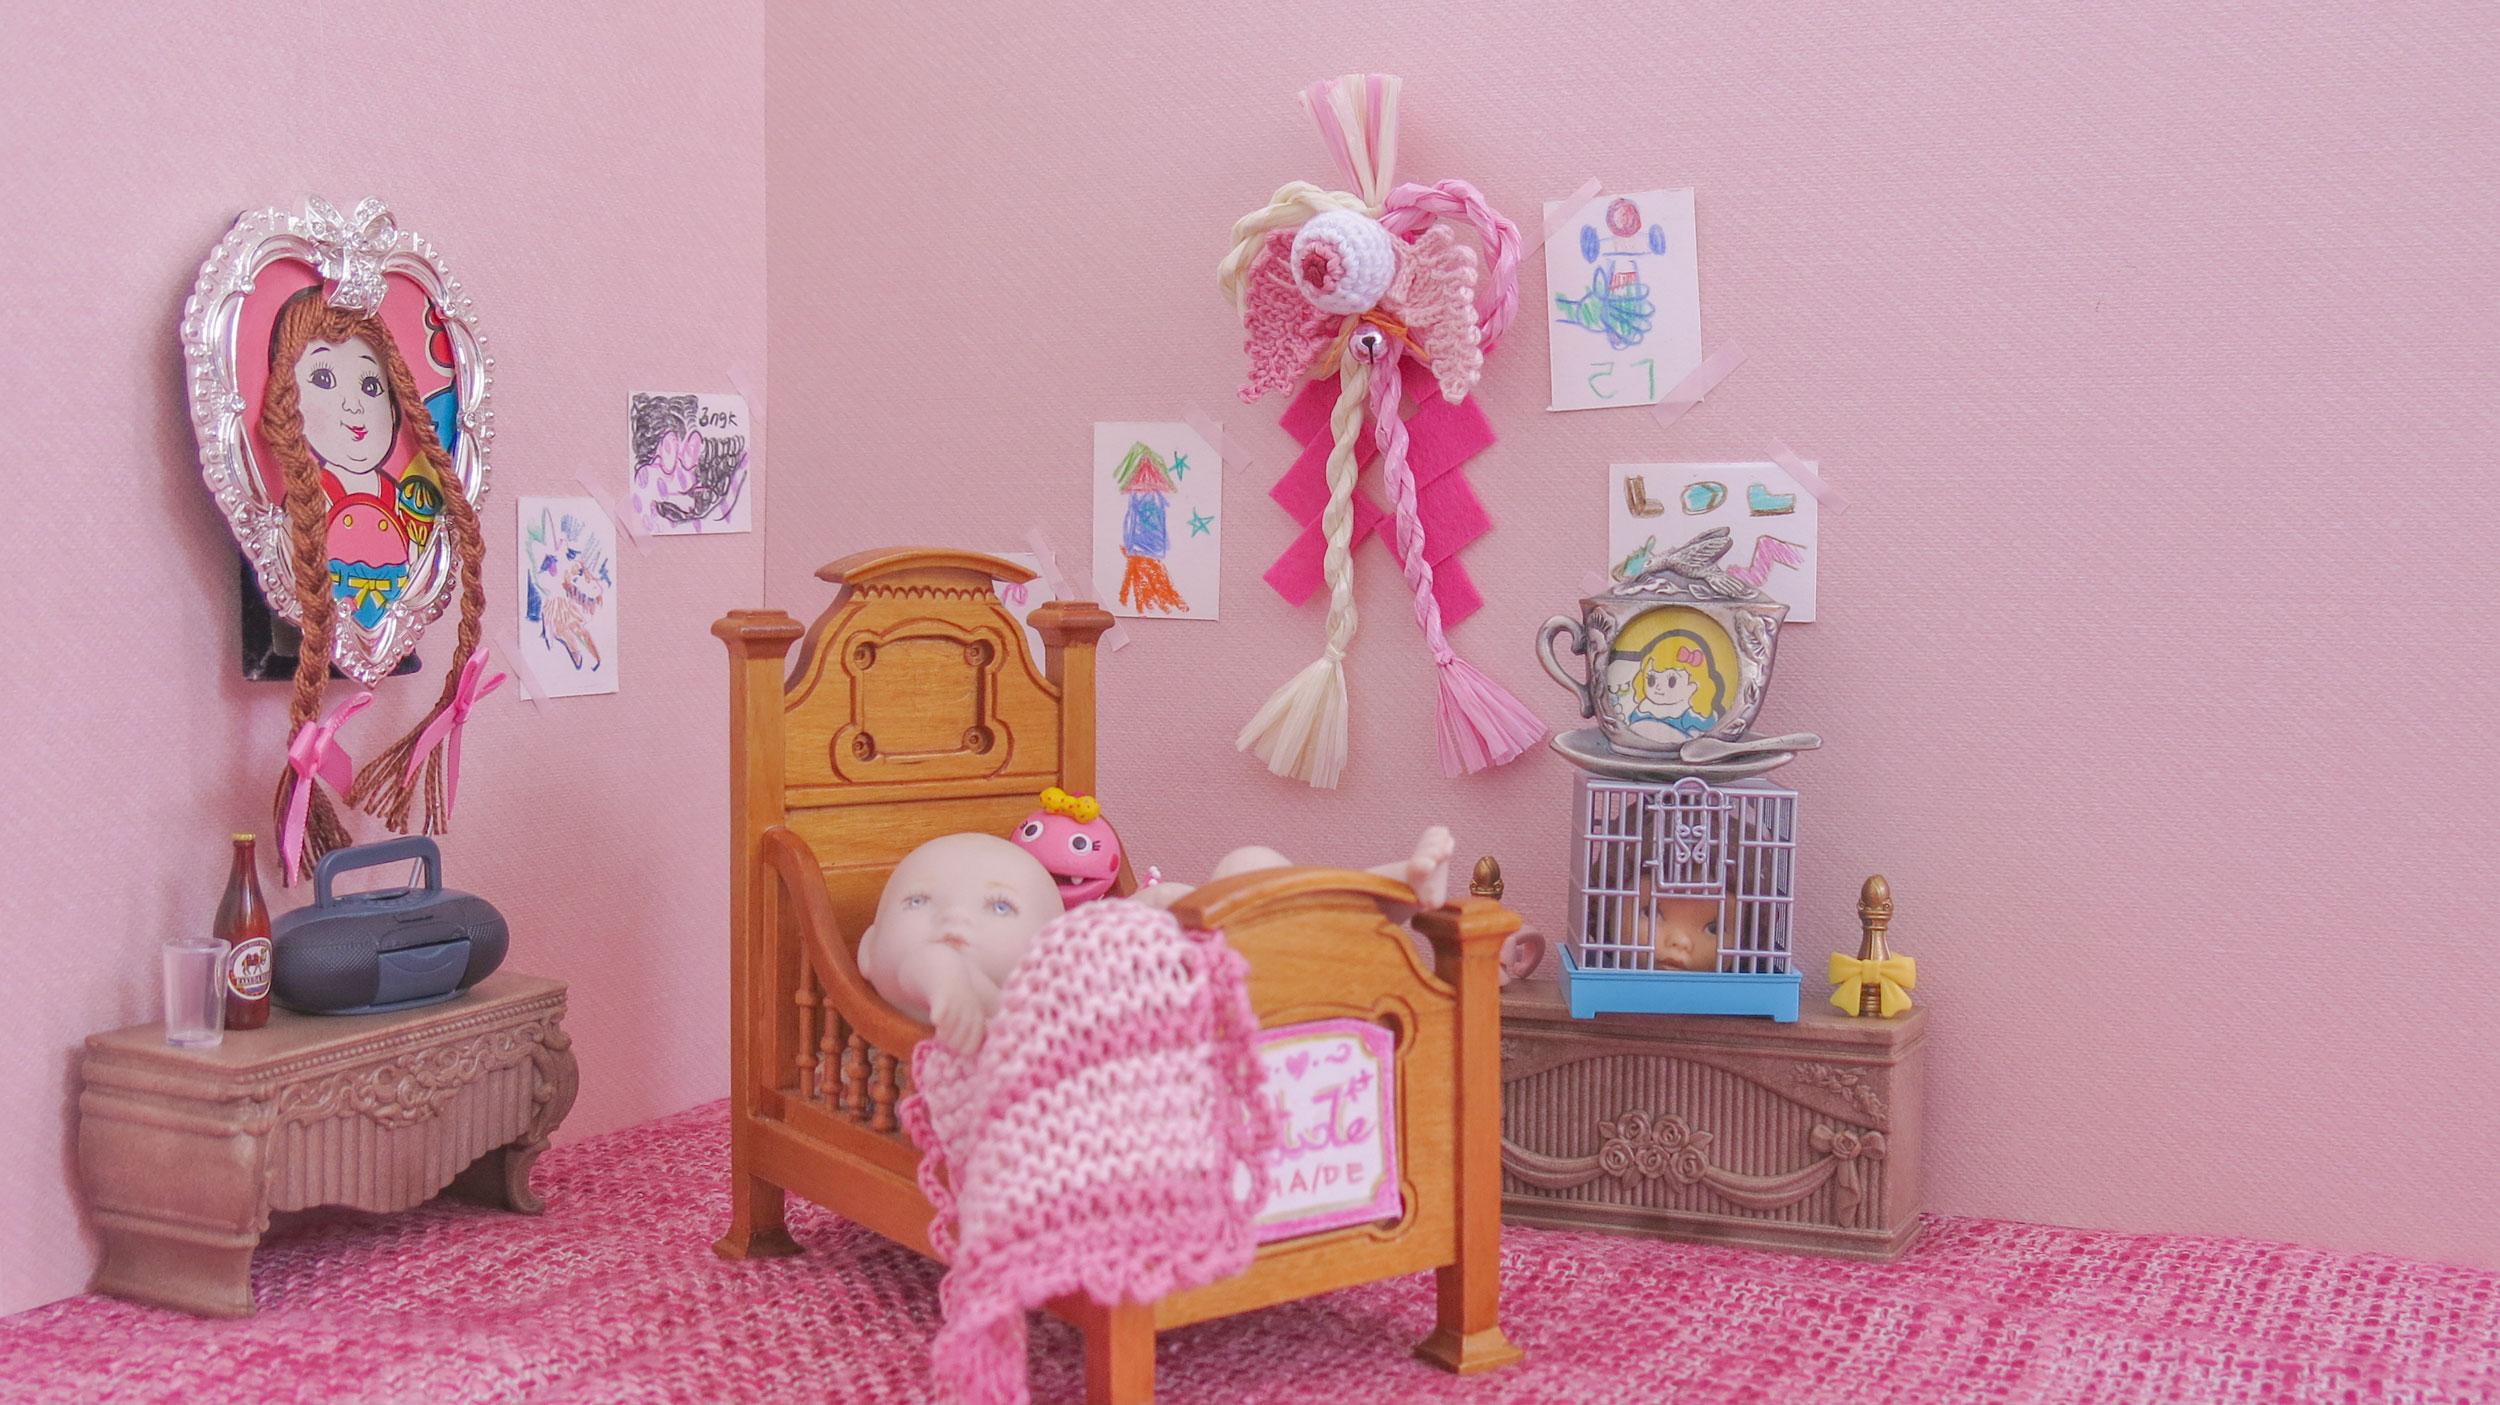 CHIISANA ROOM - 小さな部屋 (LITTLE ROOM)